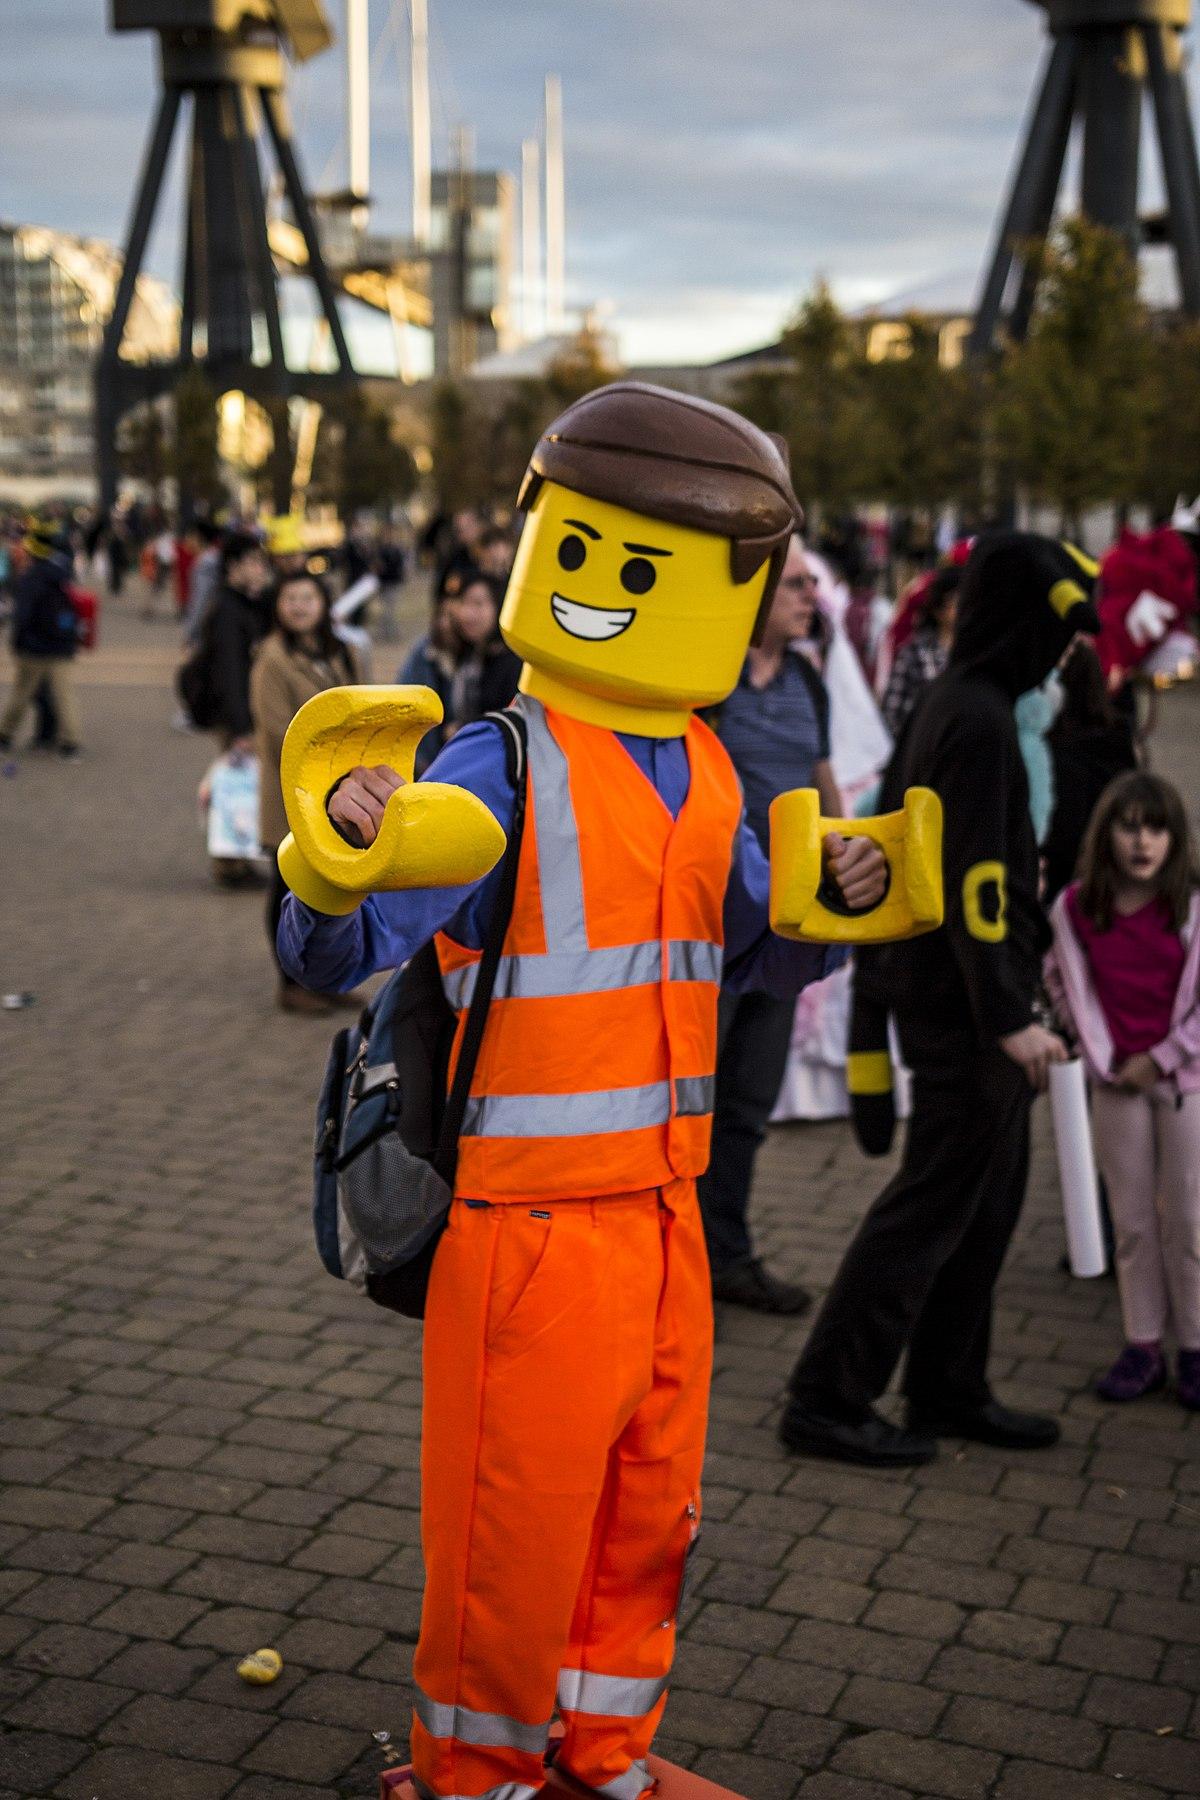 Animation Movie Wallpaper The Lego Movie 2 The Second Part Wikipedia La